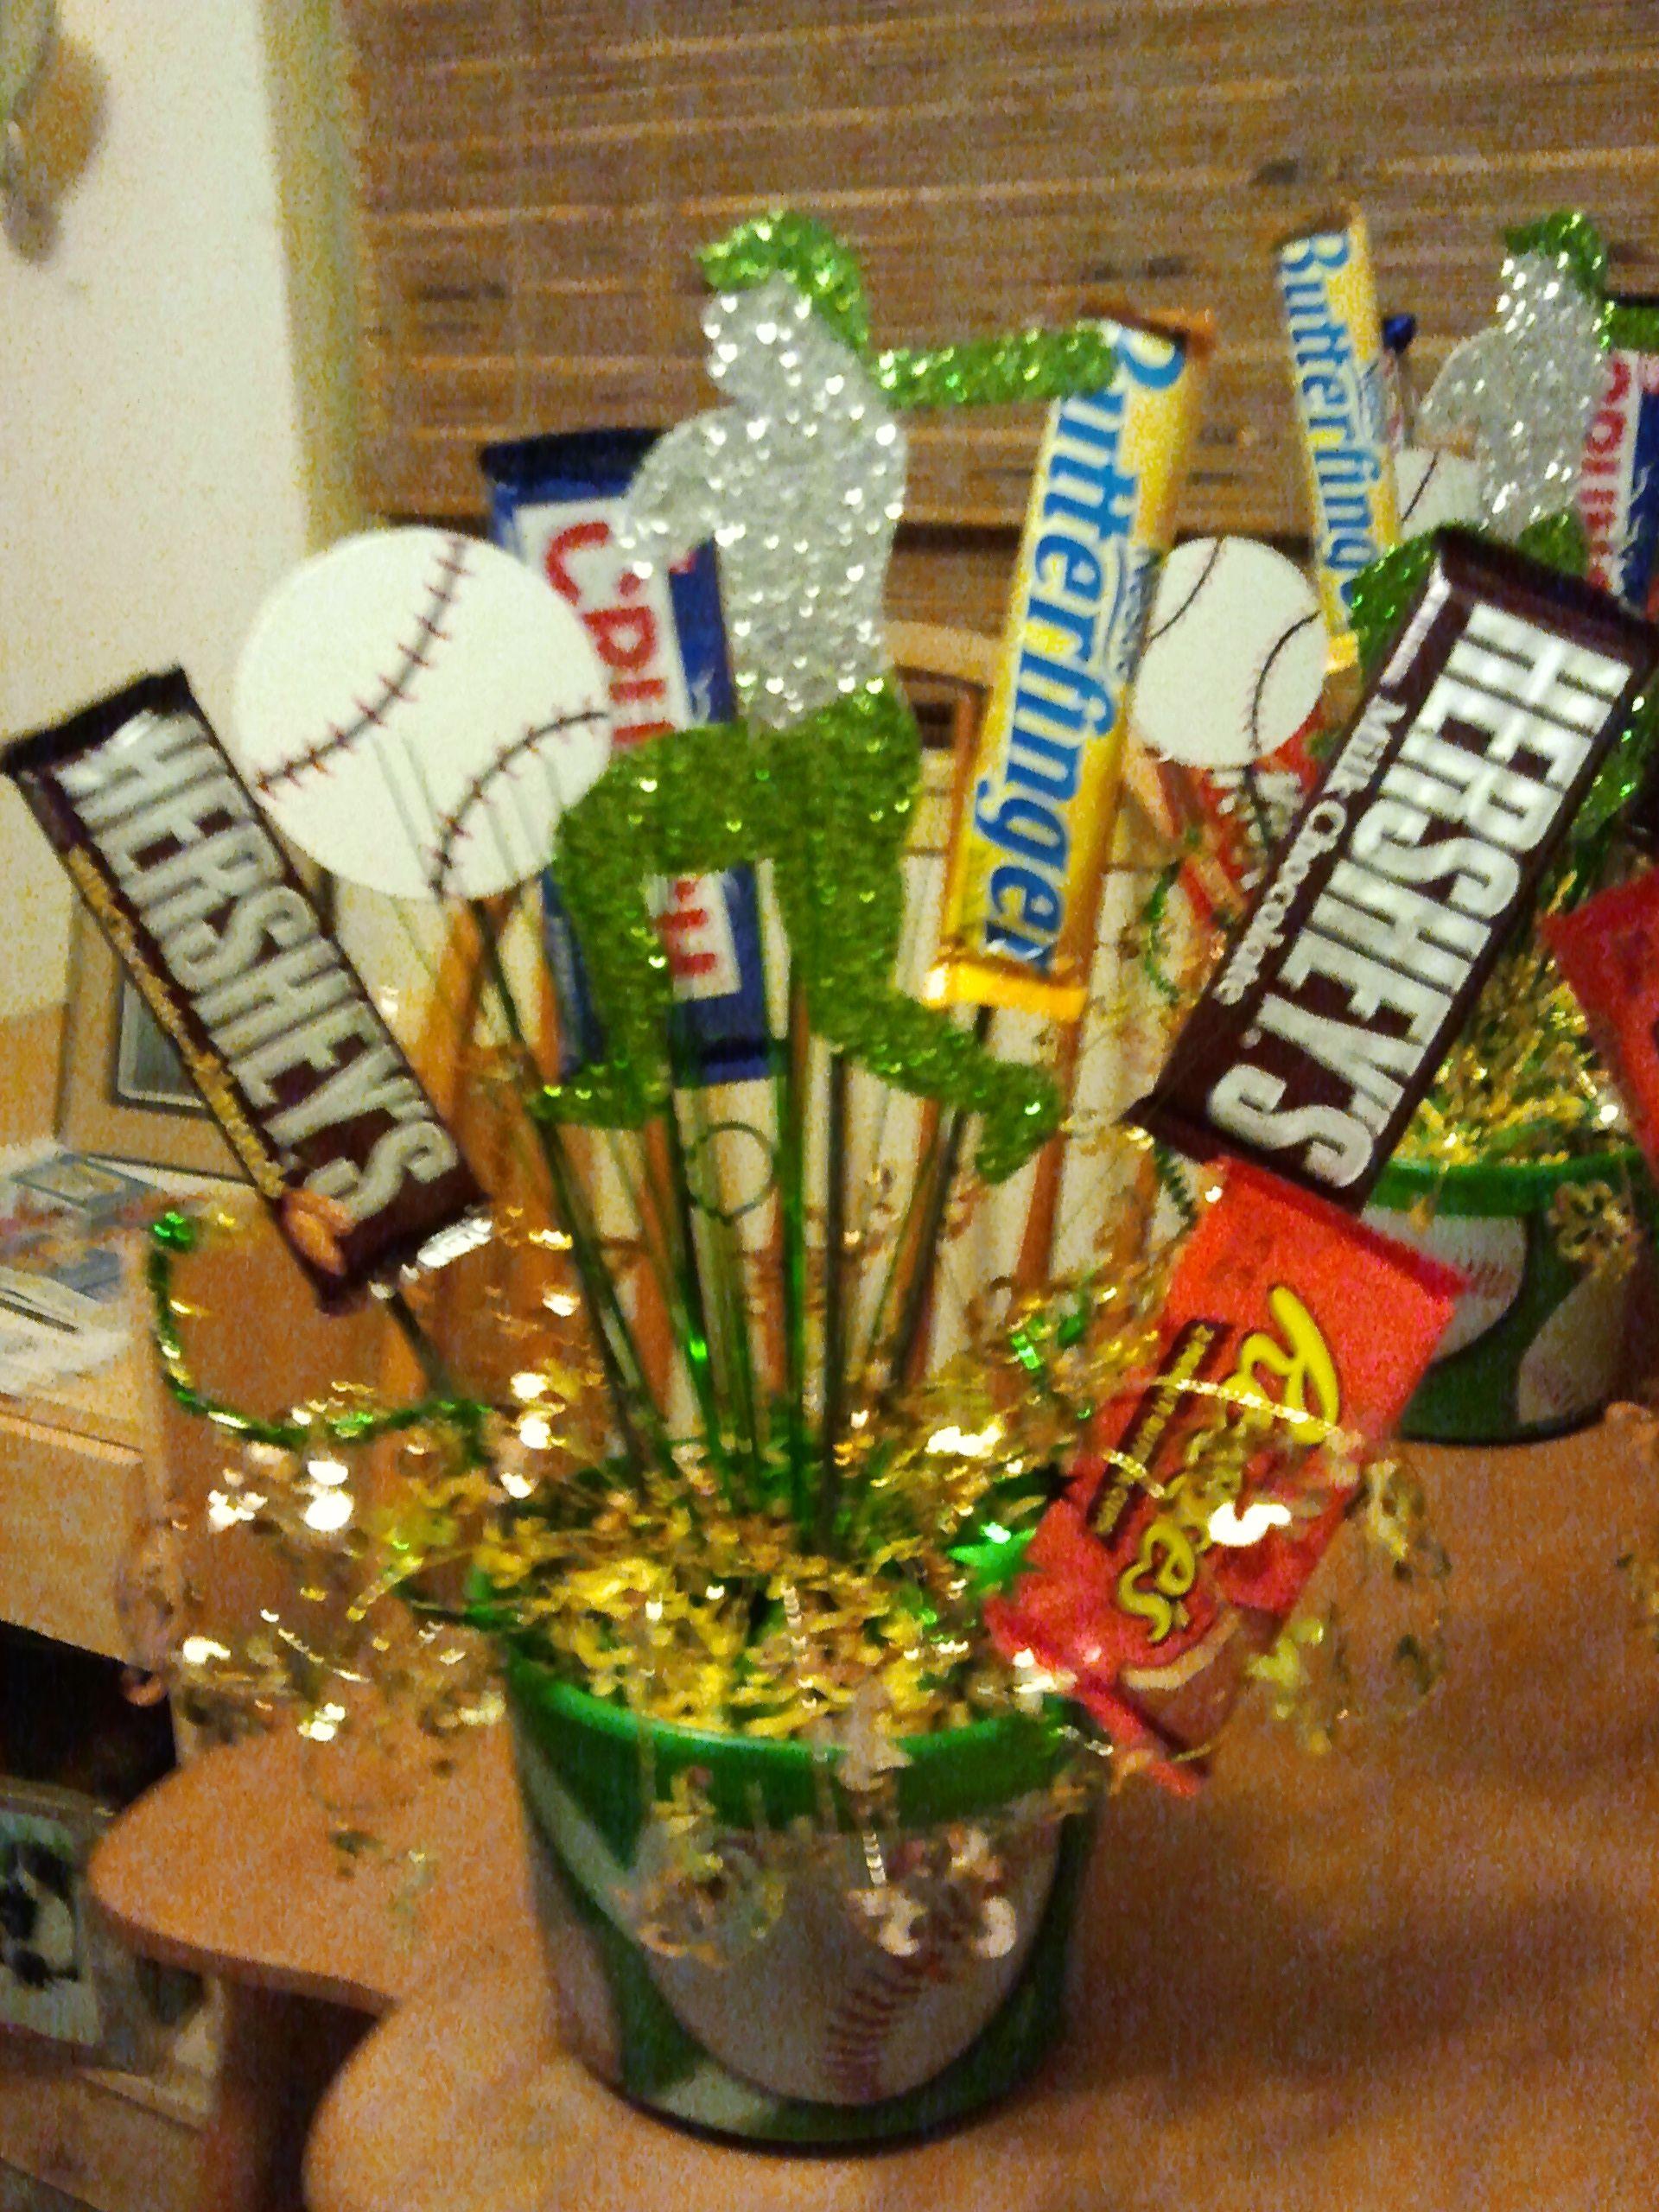 Baseball Banquet Centerpieces : Baseball banquet centerpieces